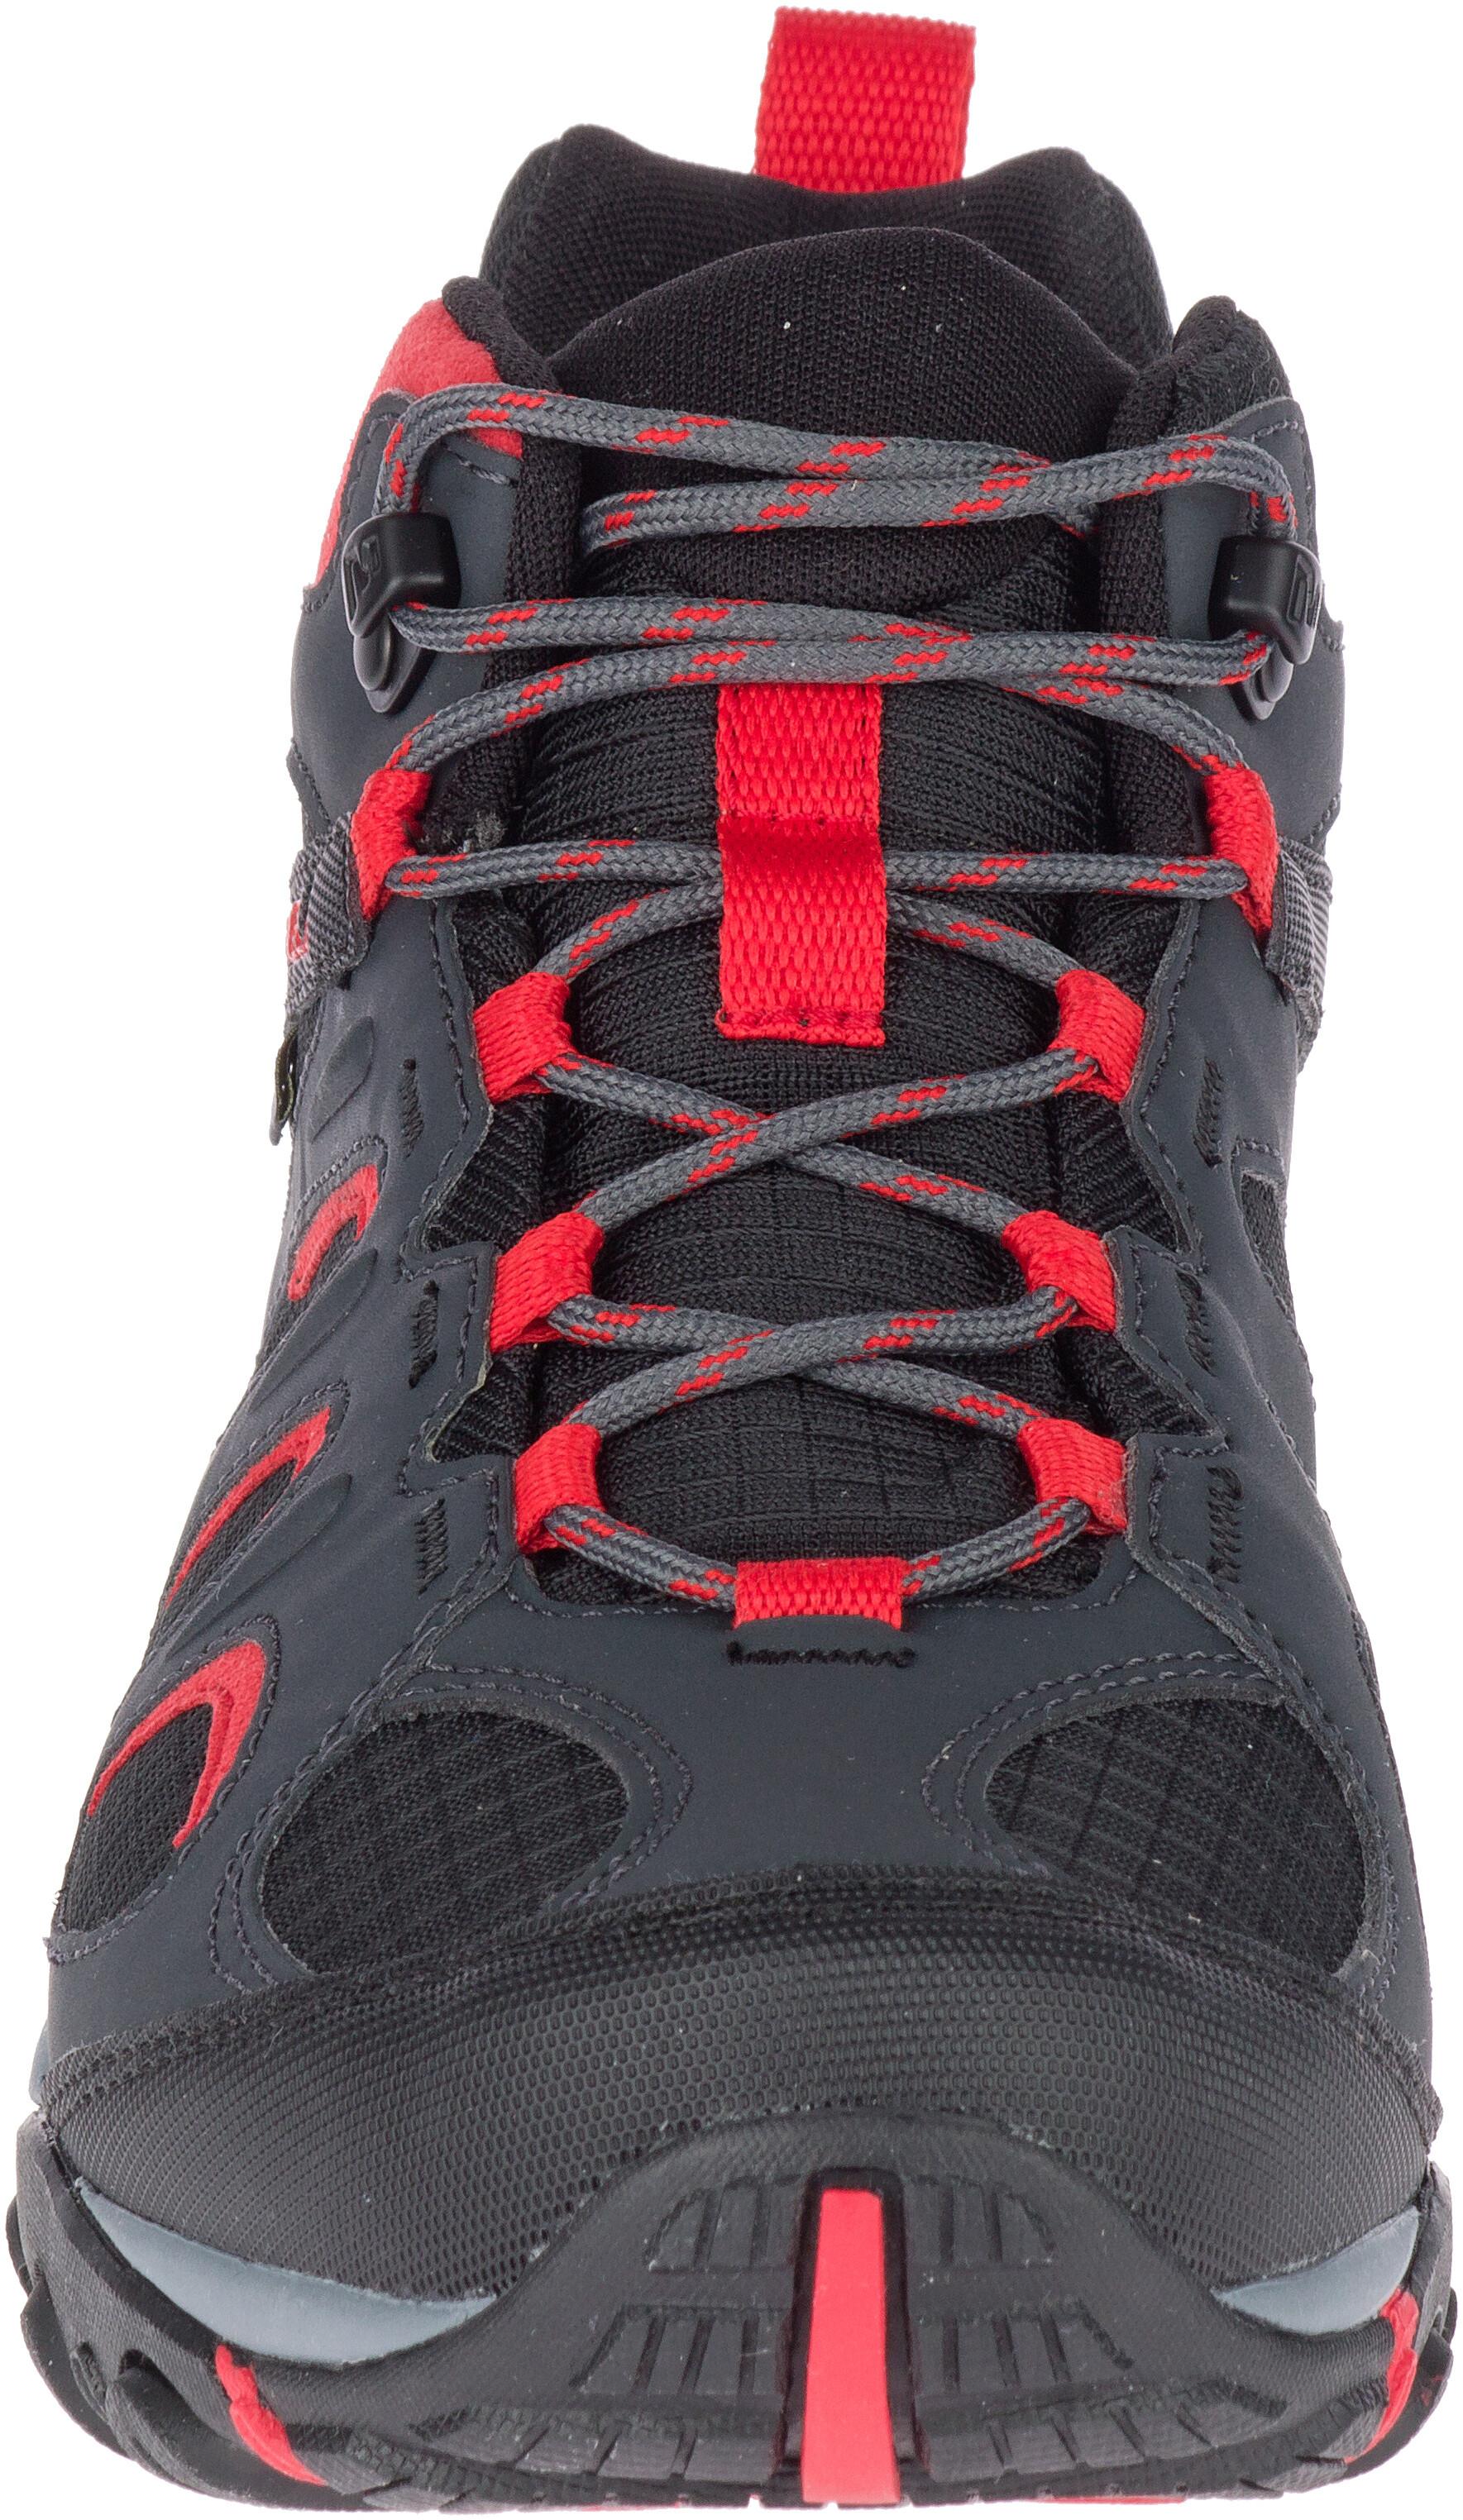 2814e086494 Merrell Yokota 2 Sport Mid GTX Shoes Men red black at Addnature.co.uk